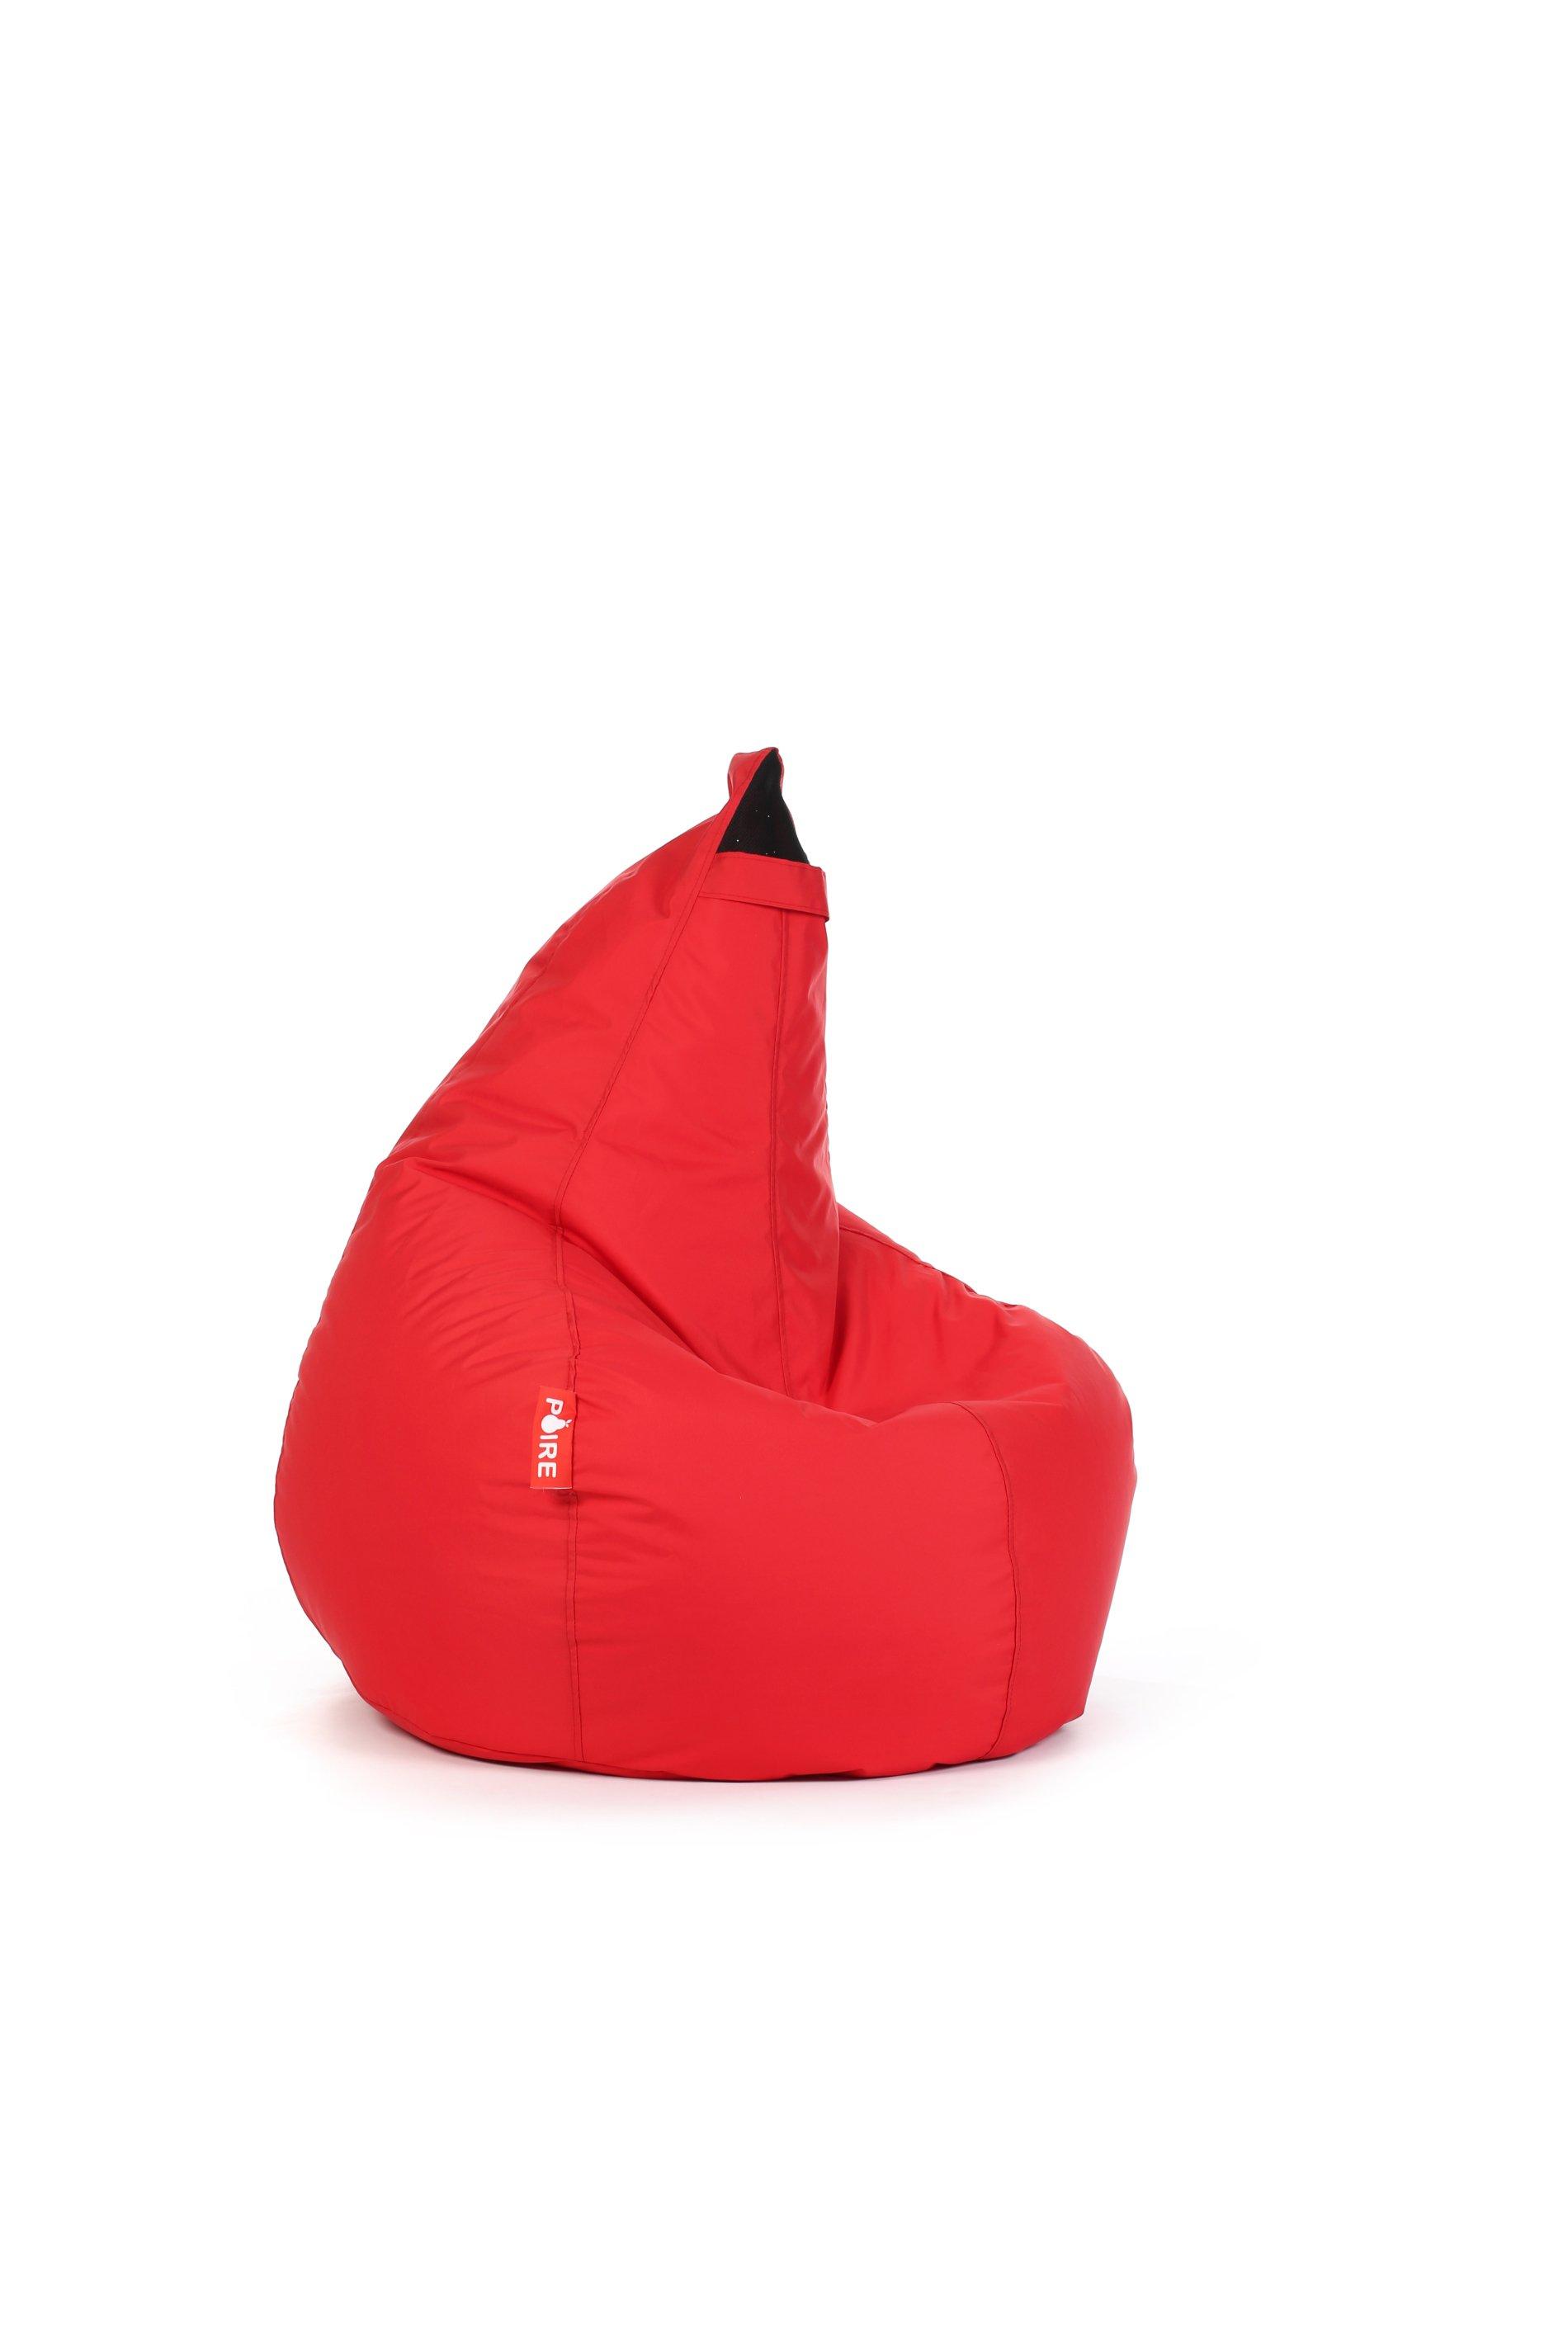 Sit In Pool Zitzak.Dropseat Red Sit On It Webshop Swimmingpools Be